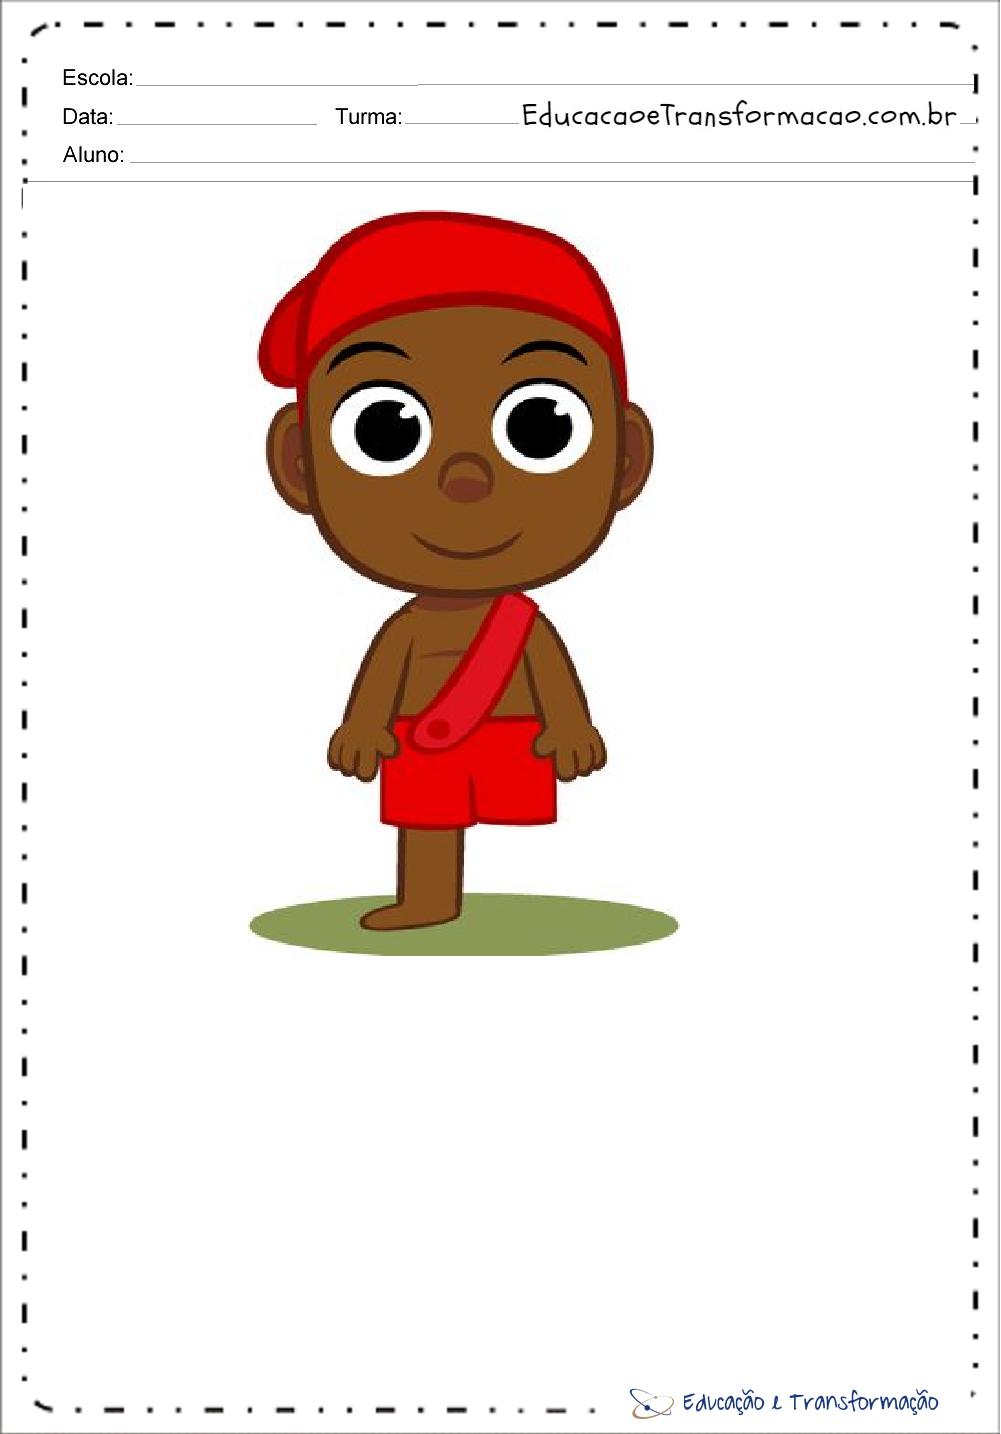 Desenhos Do Saci Perere Colorido Para Imprimir Educacao E